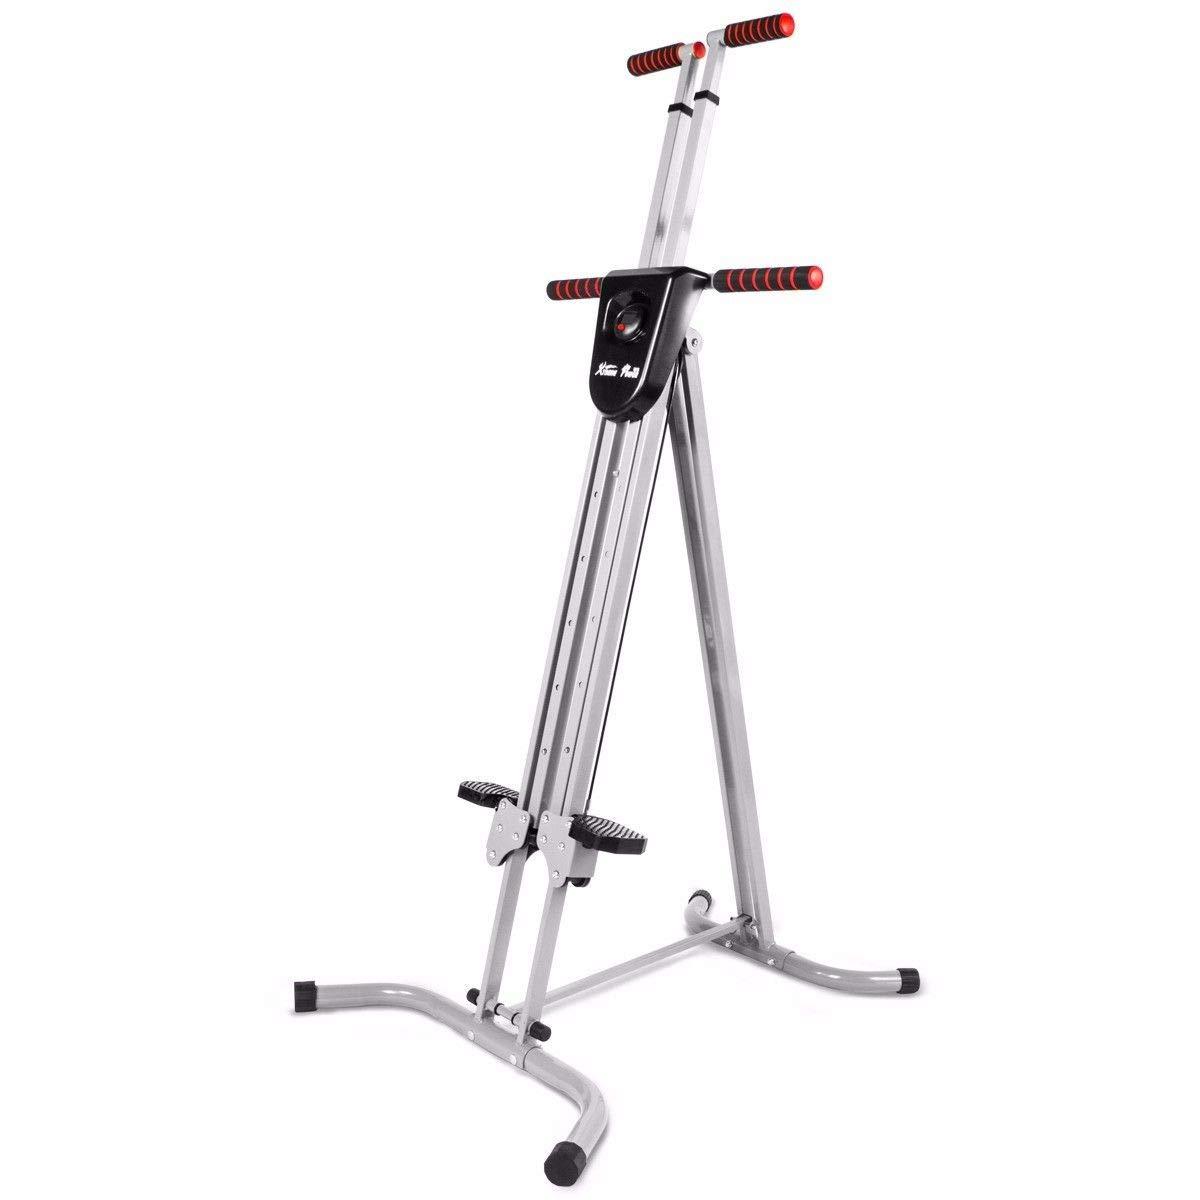 XtremepowerUS Vertical Climber Fitness Cardio Exercise Machine by XtremepowerUS (Image #4)